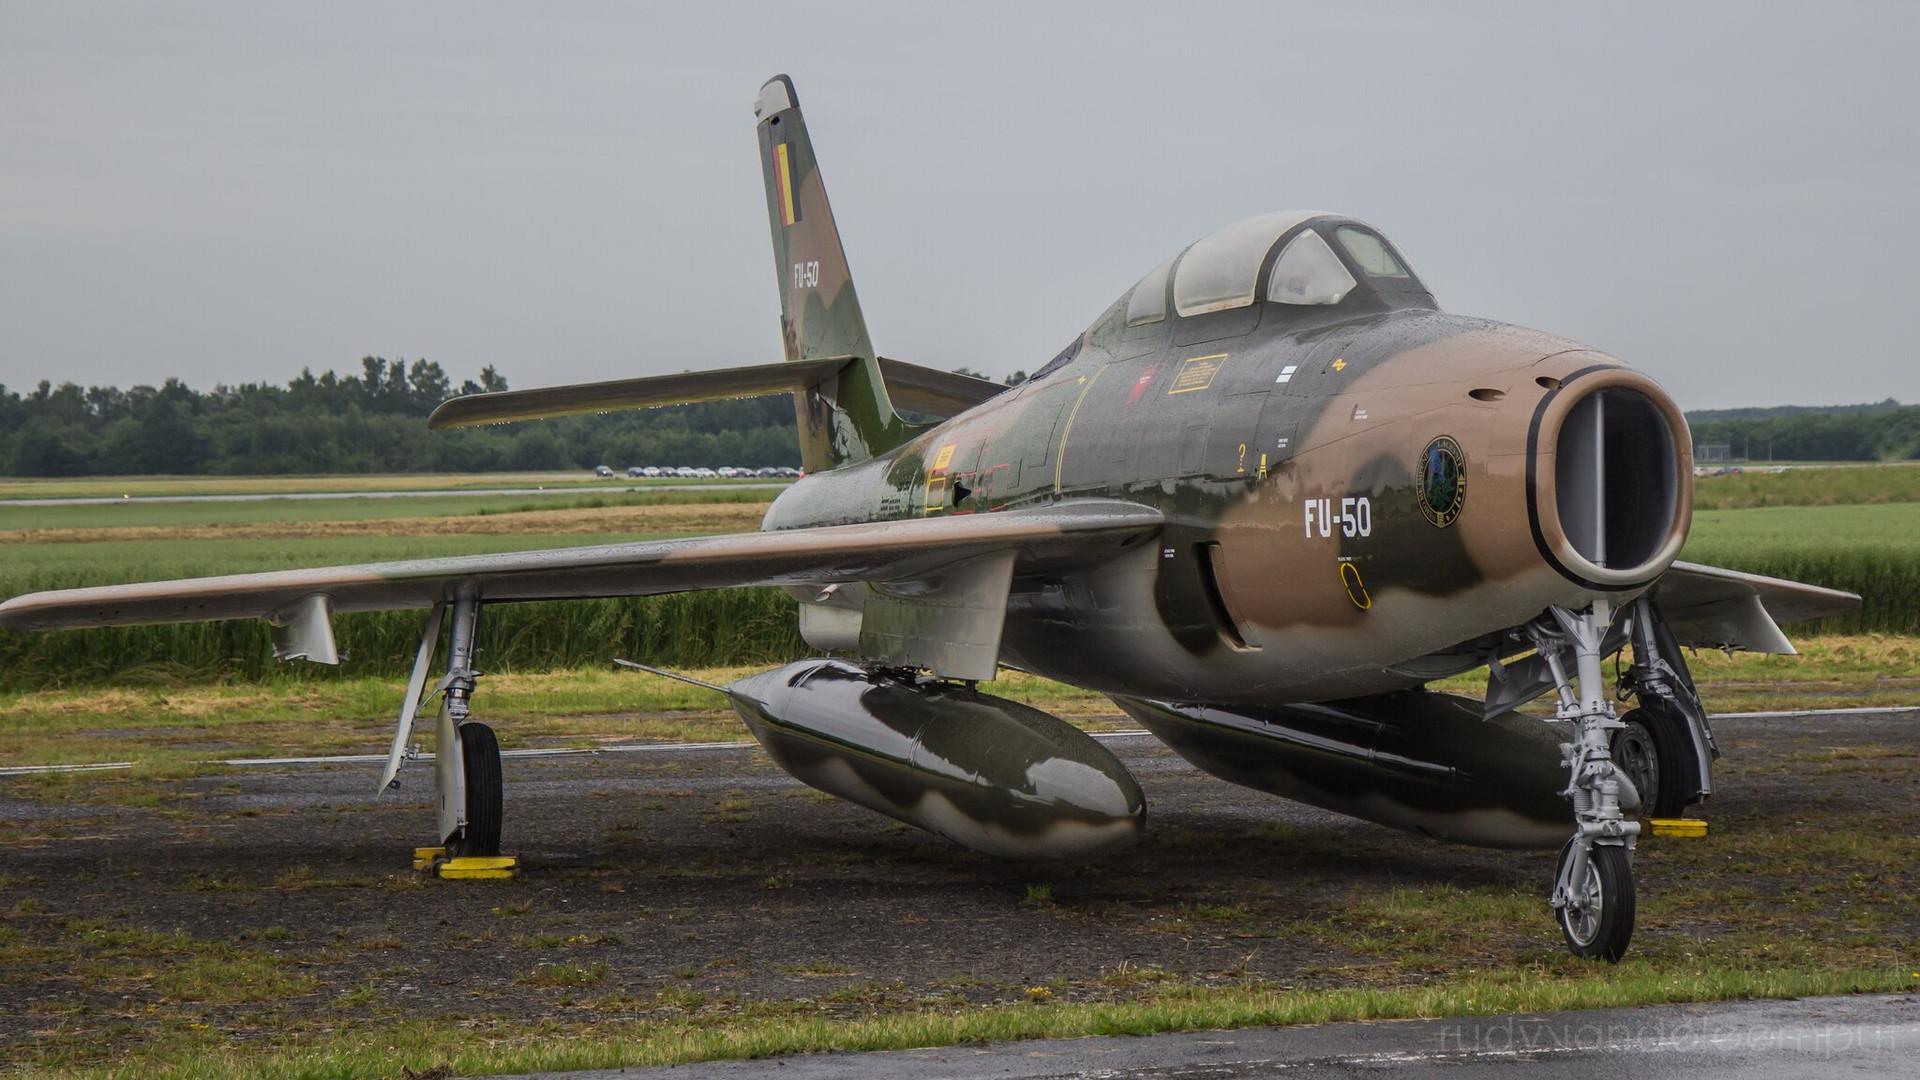 FU-50 | Build: .... - Republic F-84F Thunderstreak